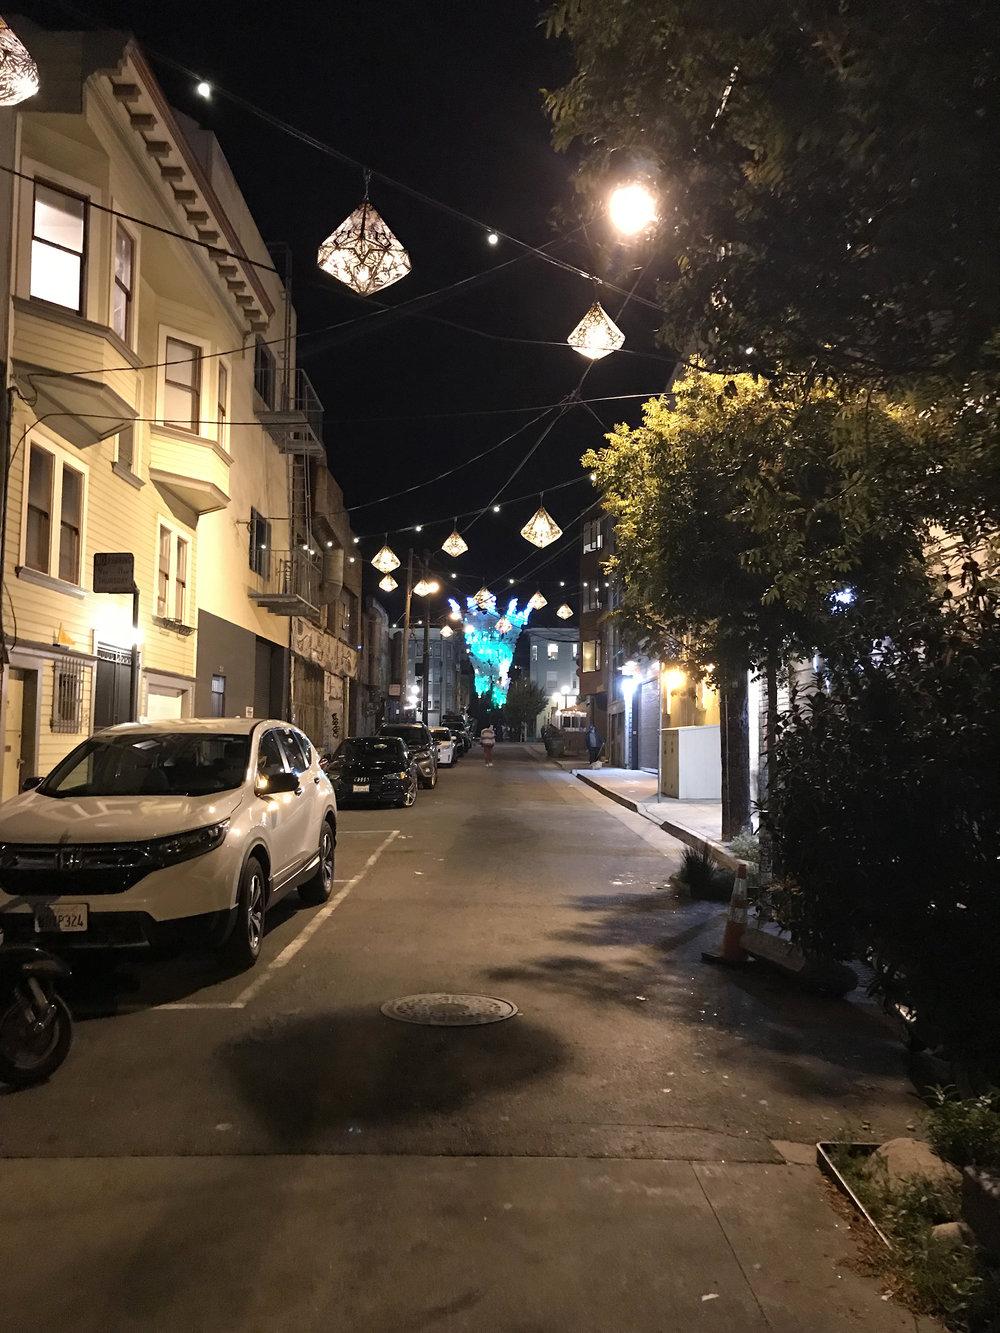 The new hanging lanterns light up Linden Alley after dark